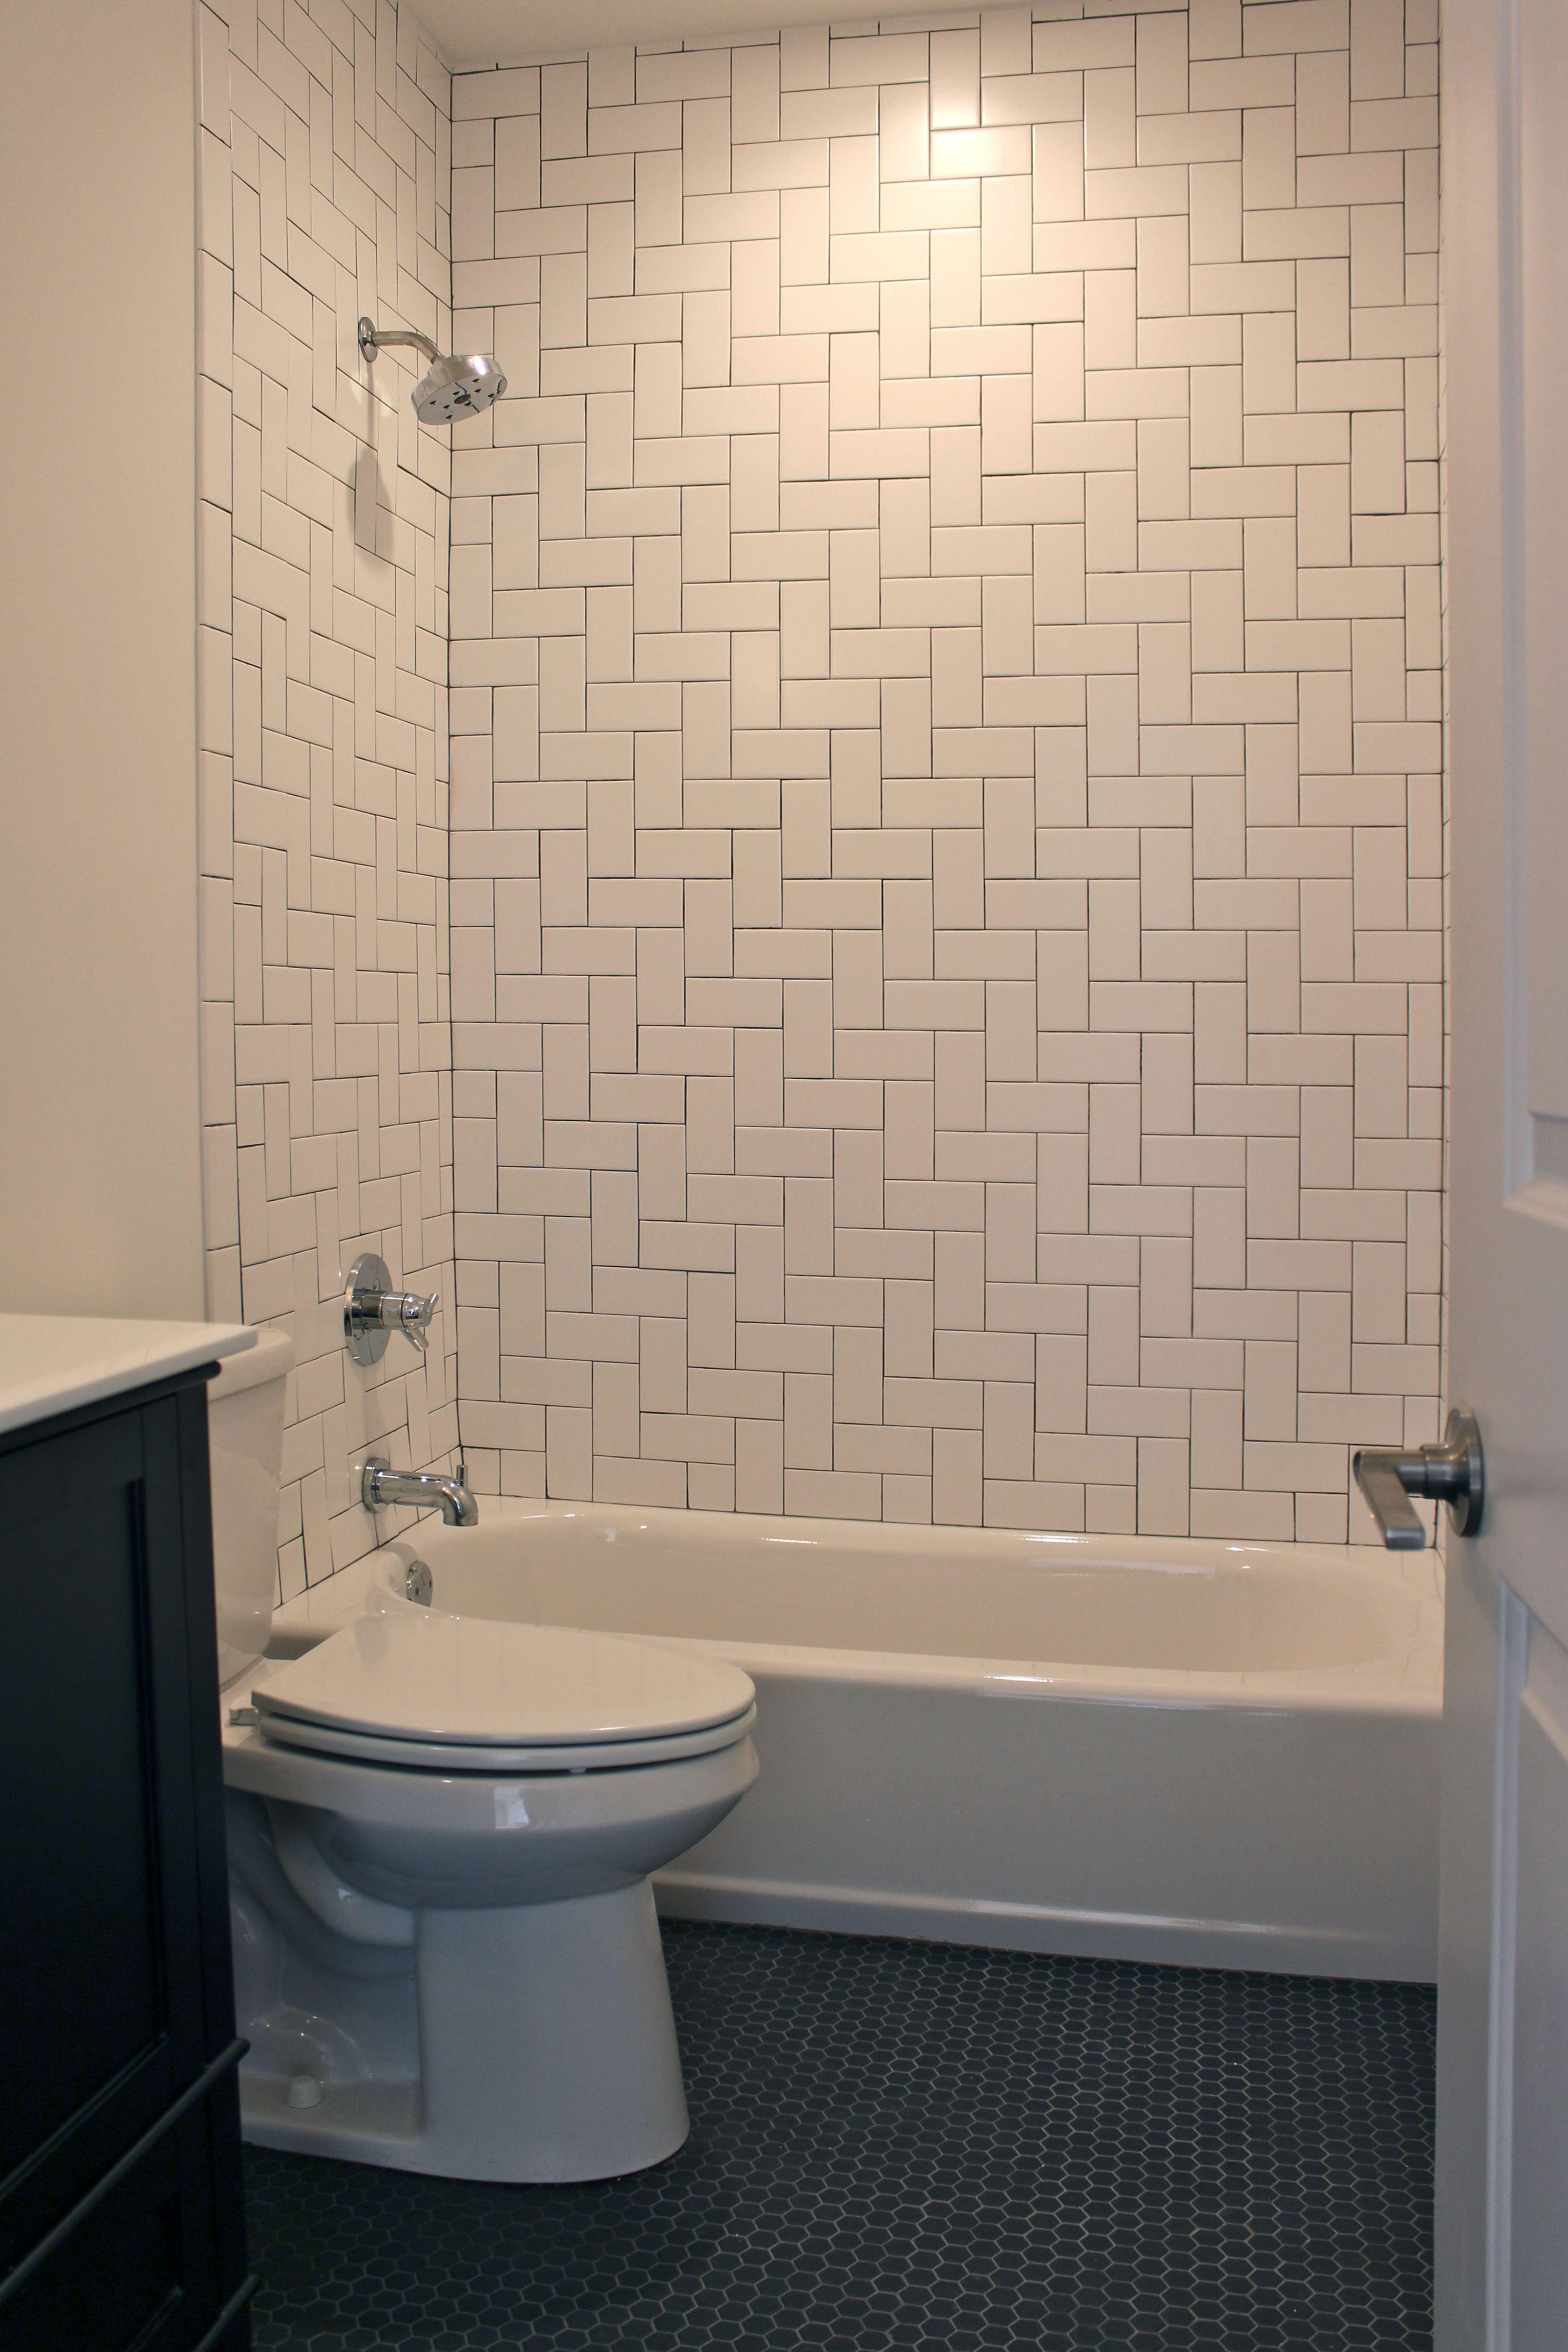 Bathroom With Herringbone Pattern White Subway Tile Surround And